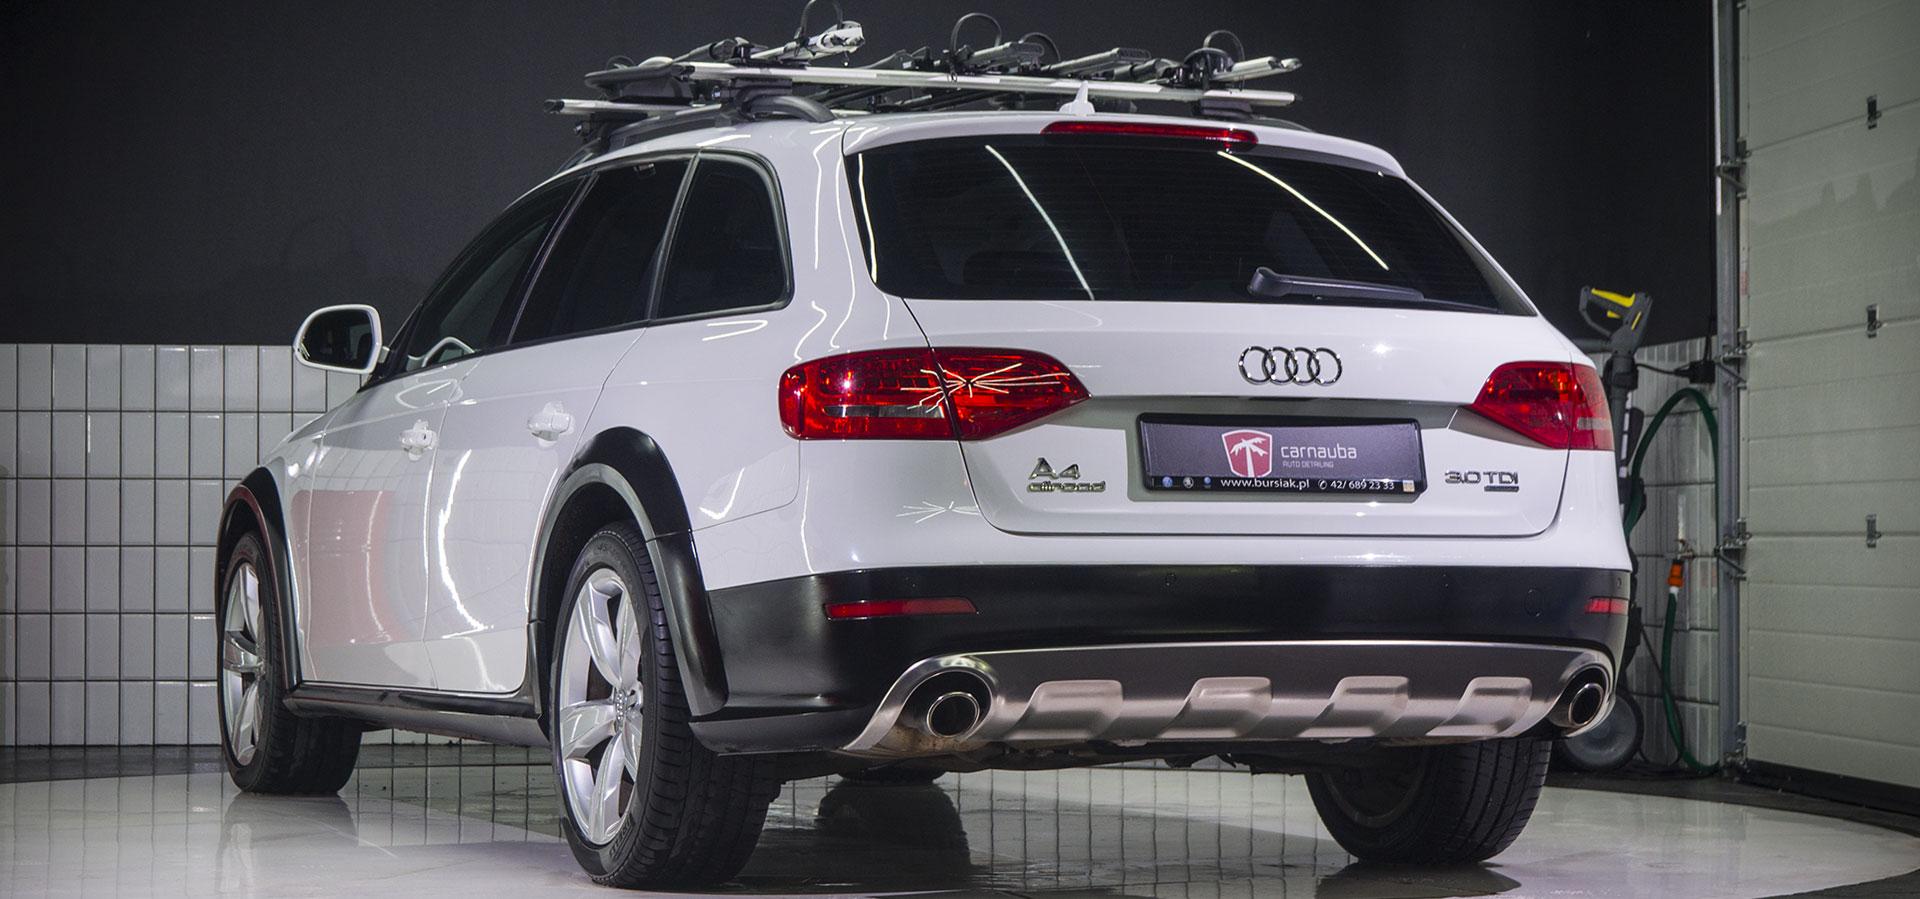 Audi A4 Allroad - po myciu